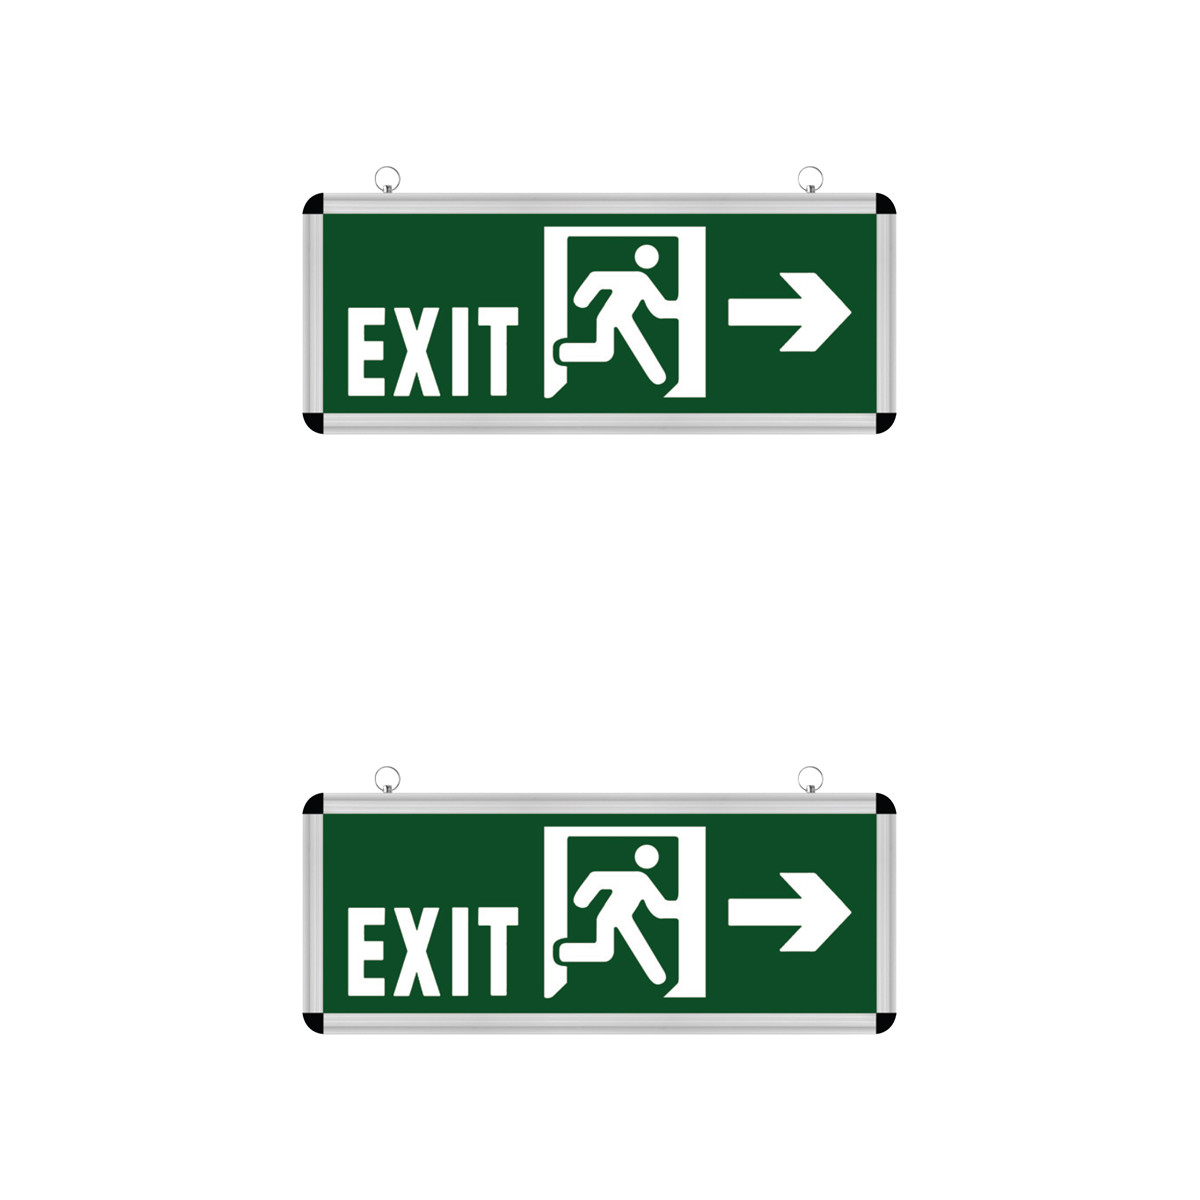 LED Noodverlichting Exit - 2 Pack - Rabonta Links/Rechts - Hangend - 3W